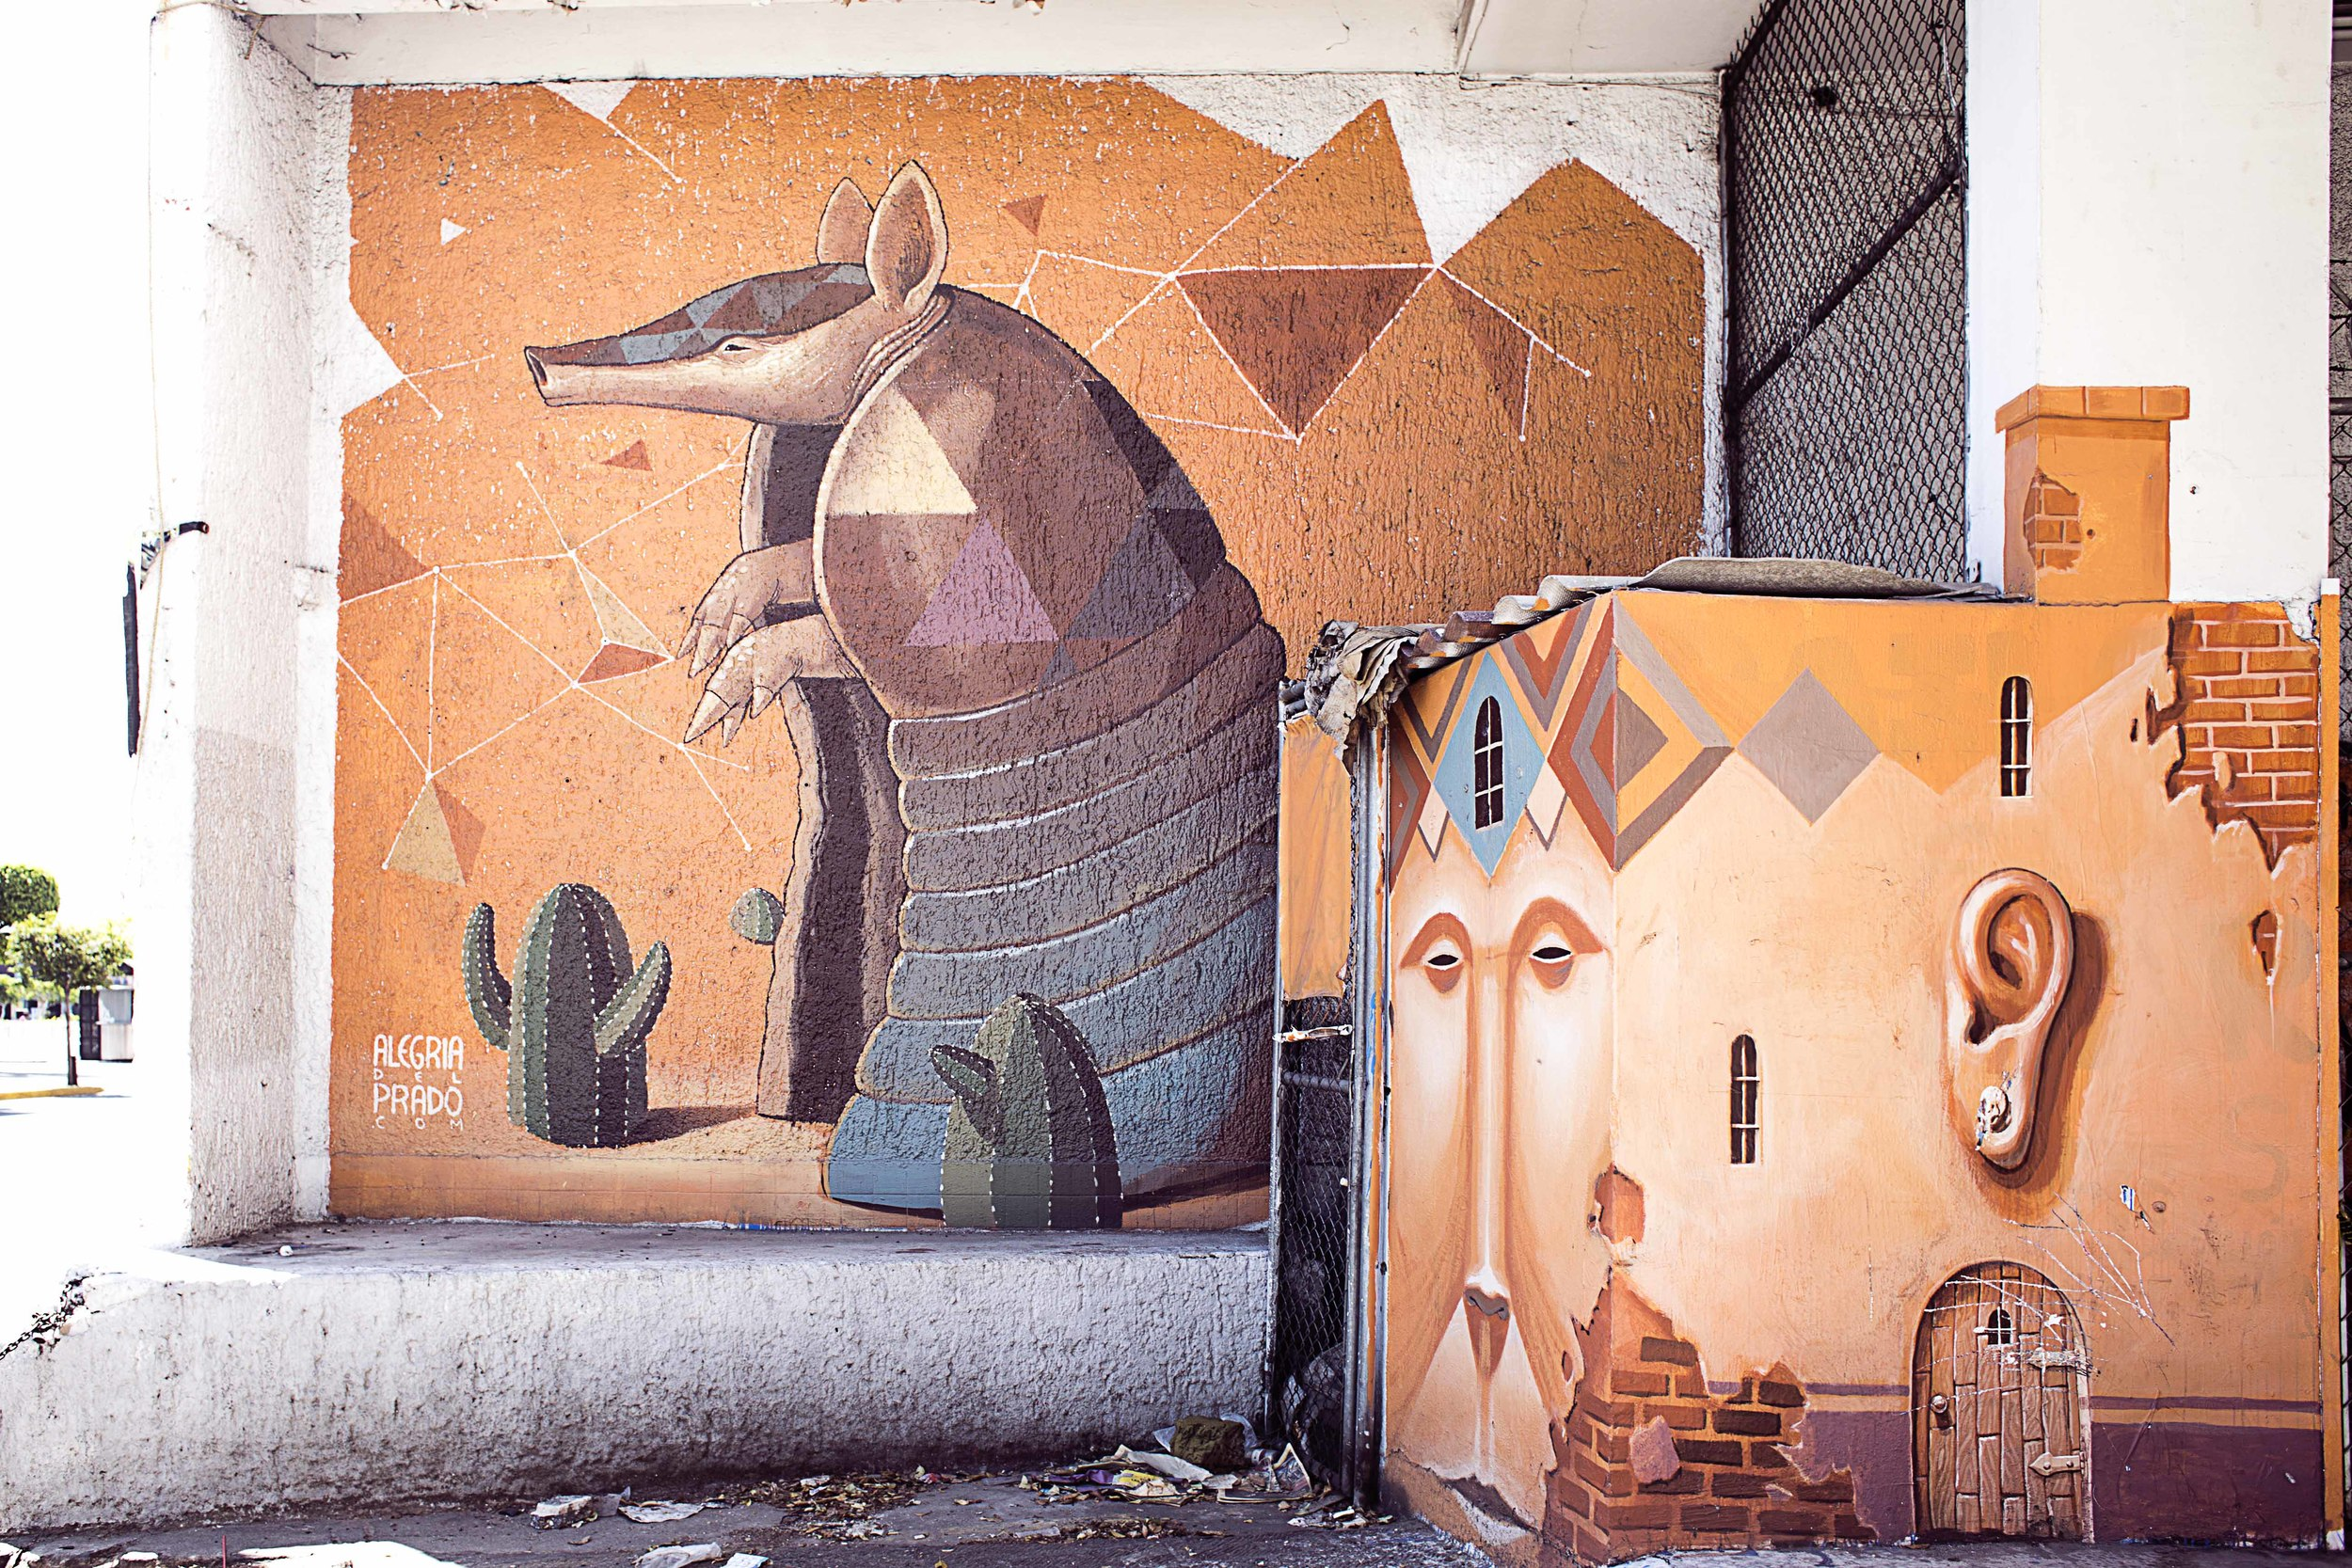 Day 62 - Guadalajara, Jalisco, Mexico   One of the many beautiful murals found in Guadalajara. From Alegria del Prado.